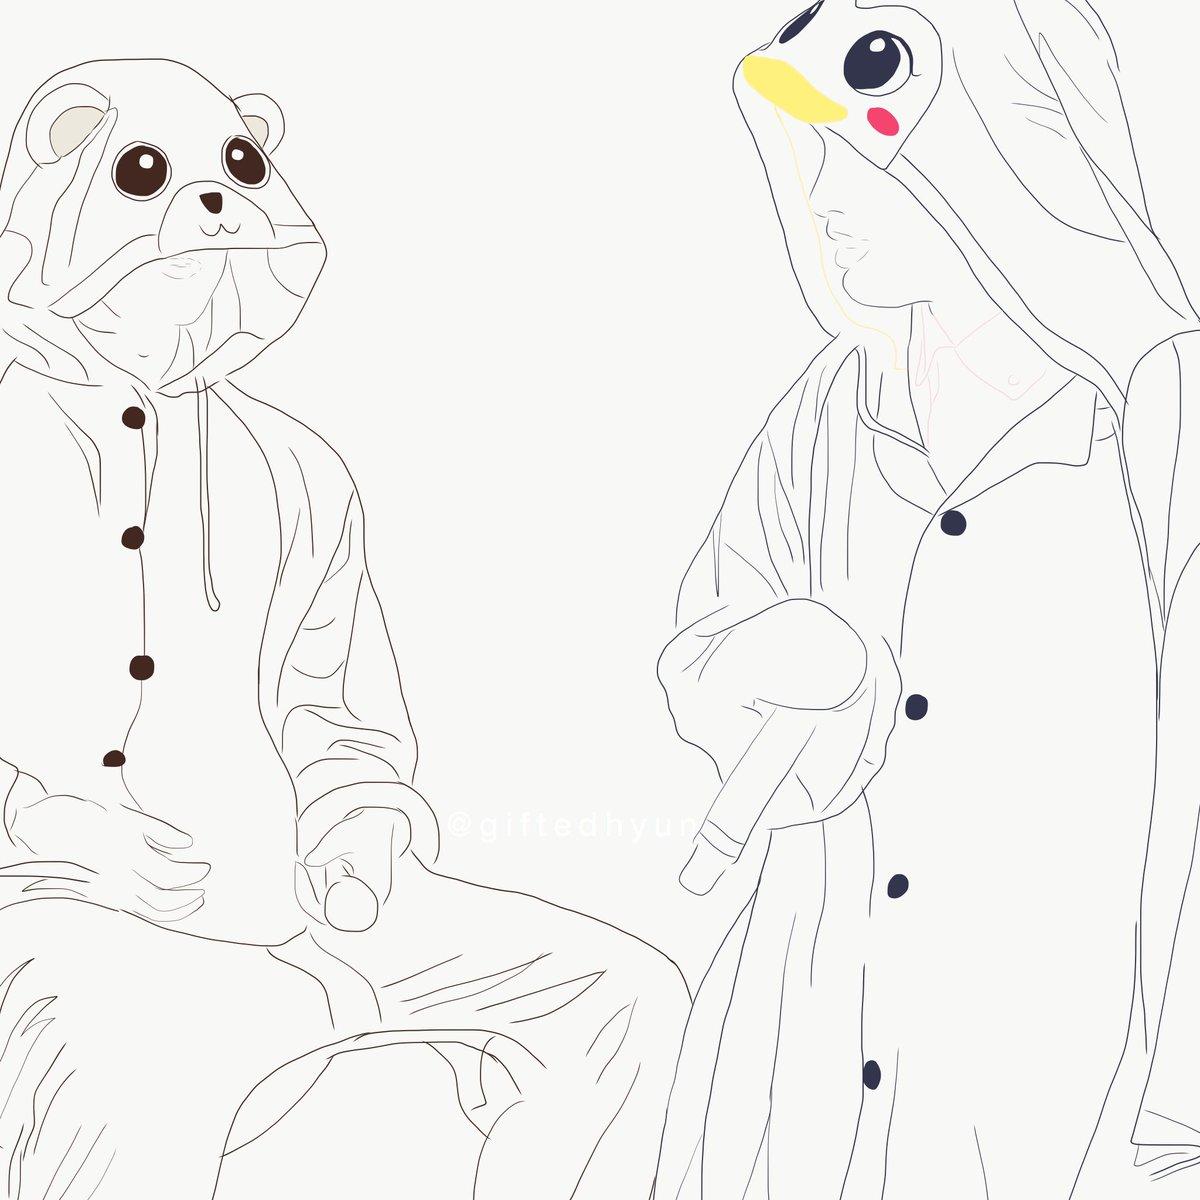 #happykyungsooday #happydyoday #happykaisooday a really really late drawing since i was so busy yesterday shjsjs<br>http://pic.twitter.com/aYB7Xz0Xpj